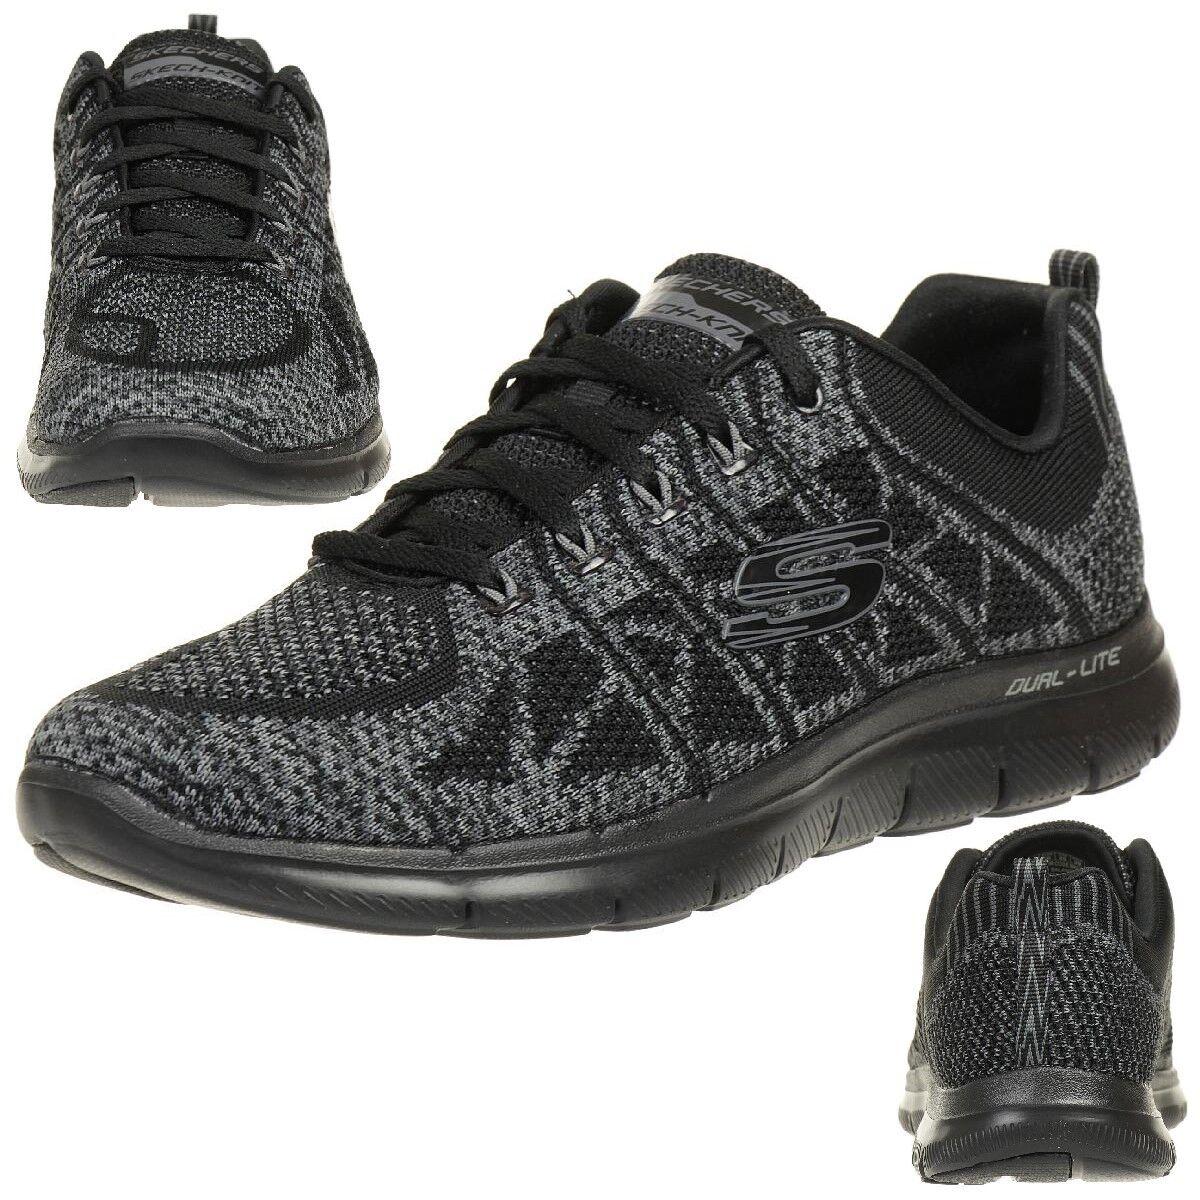 Skechers Flex Appeal 2.0 NUEVA GEM mujer Zapatos para fitness bkcc